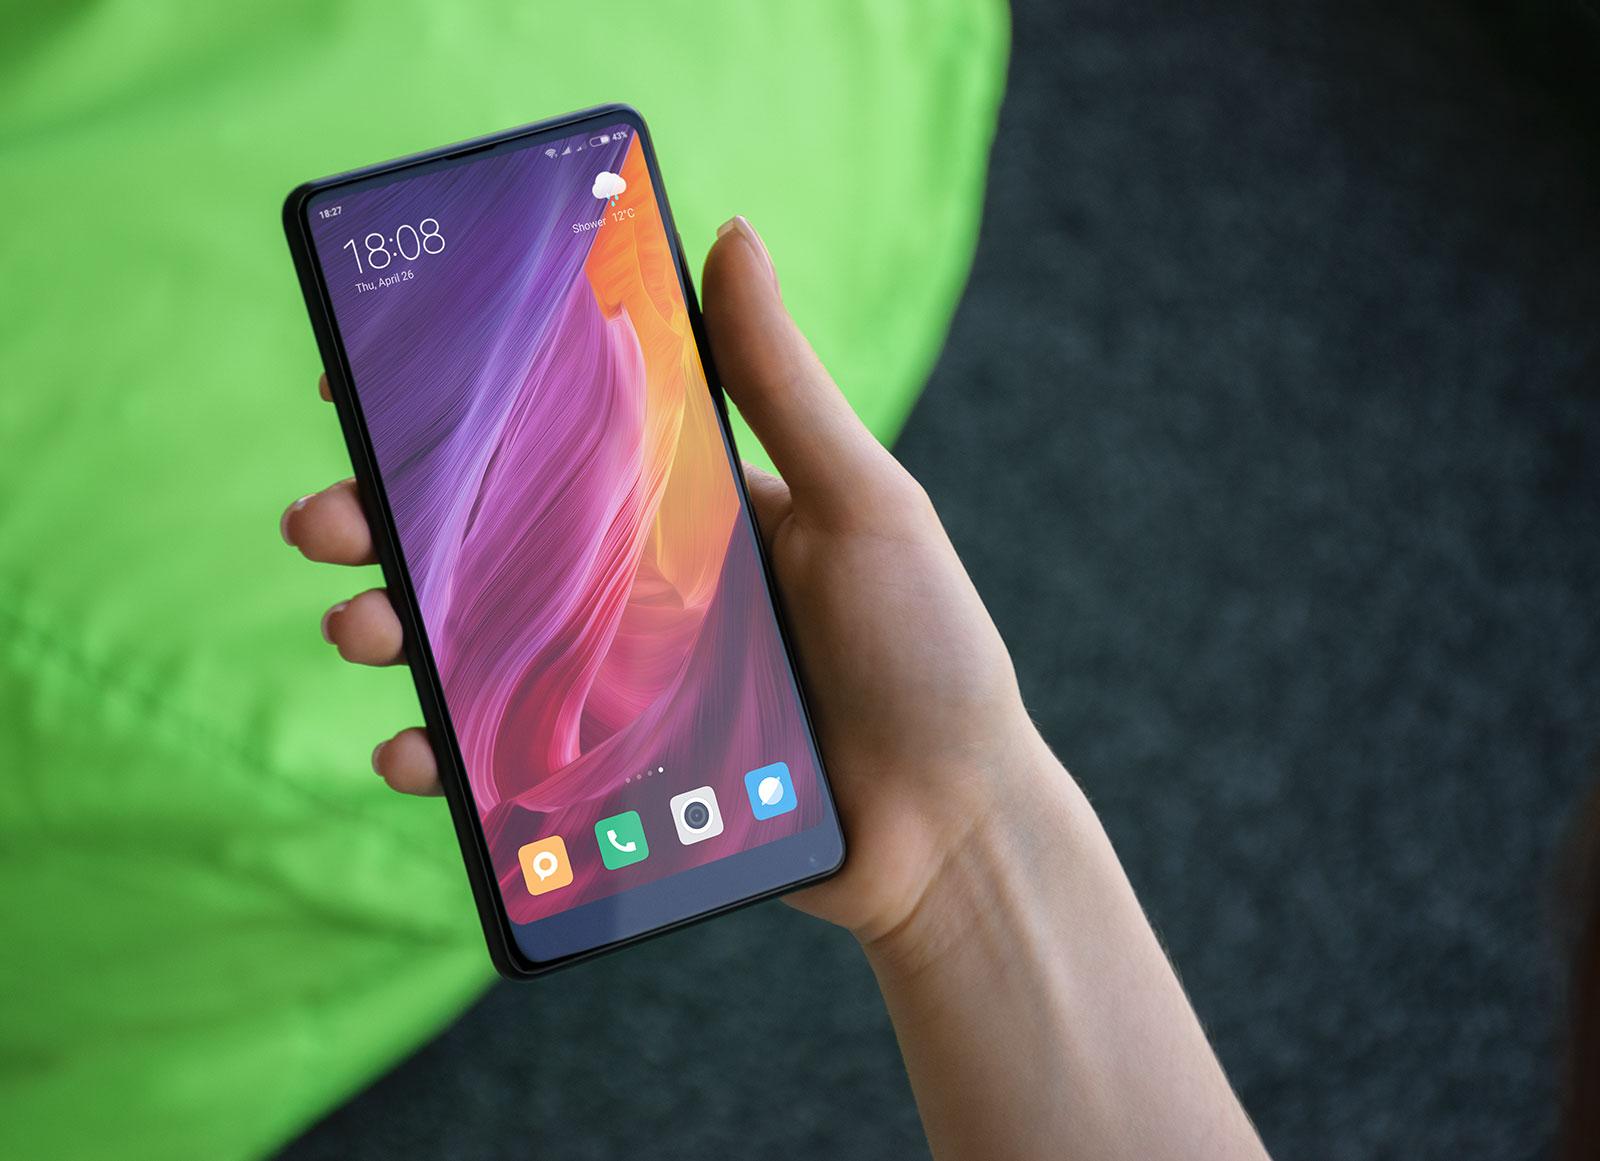 Free-Xiaomi-Mi-Mix-2-Mobile-Phone-in-Female-Hand-Mockup-PSD